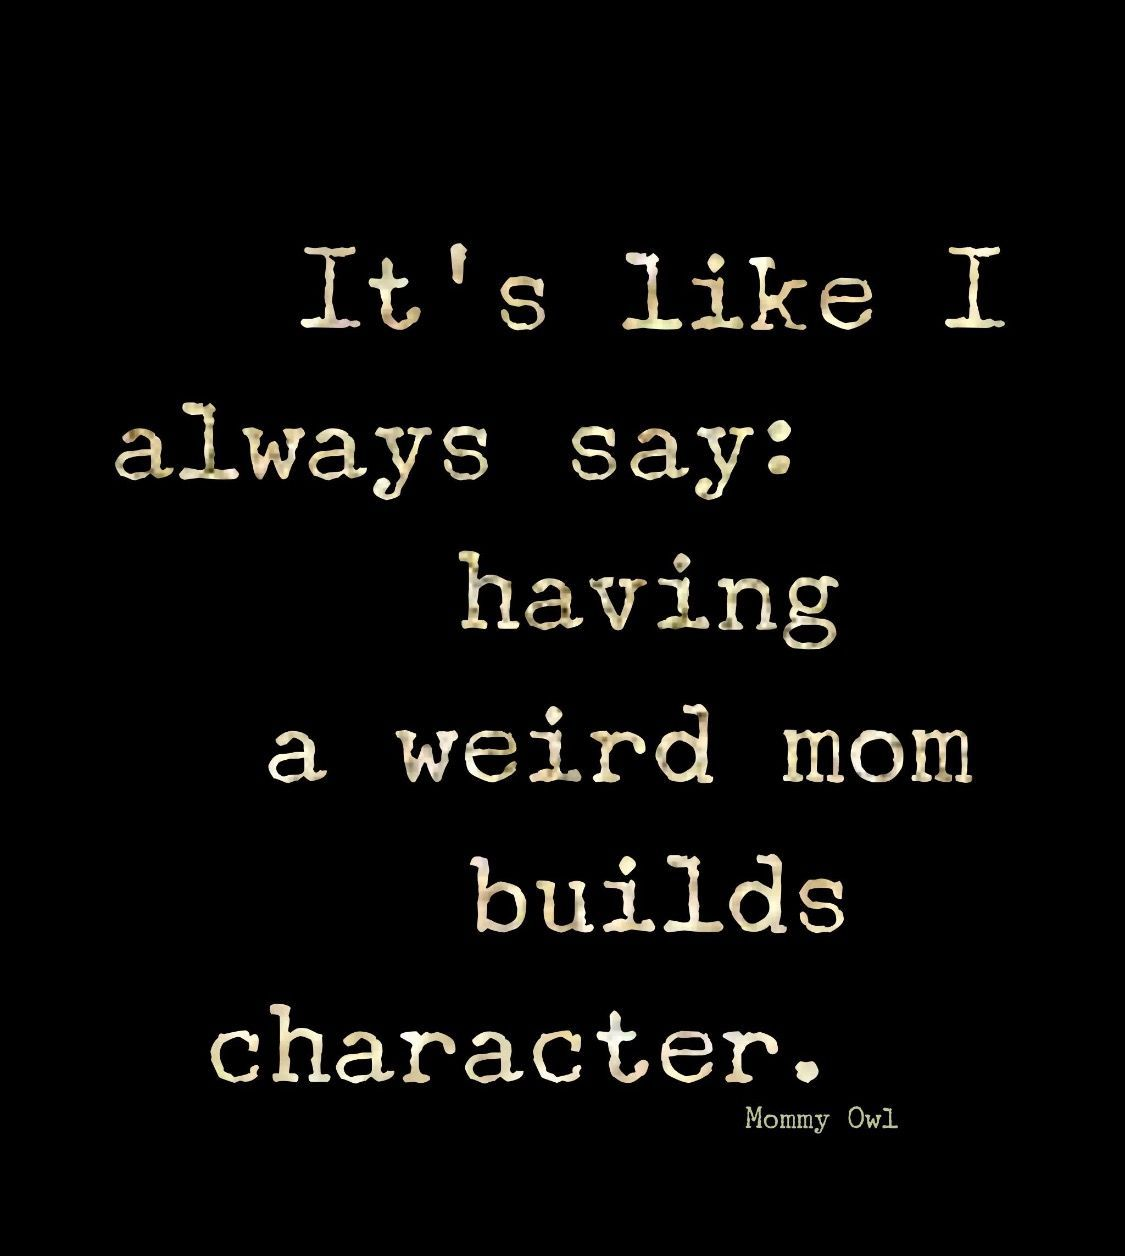 28 Funny Quotes Family Family Quotes Funny Funny Quotes Funny Quotes For Kids